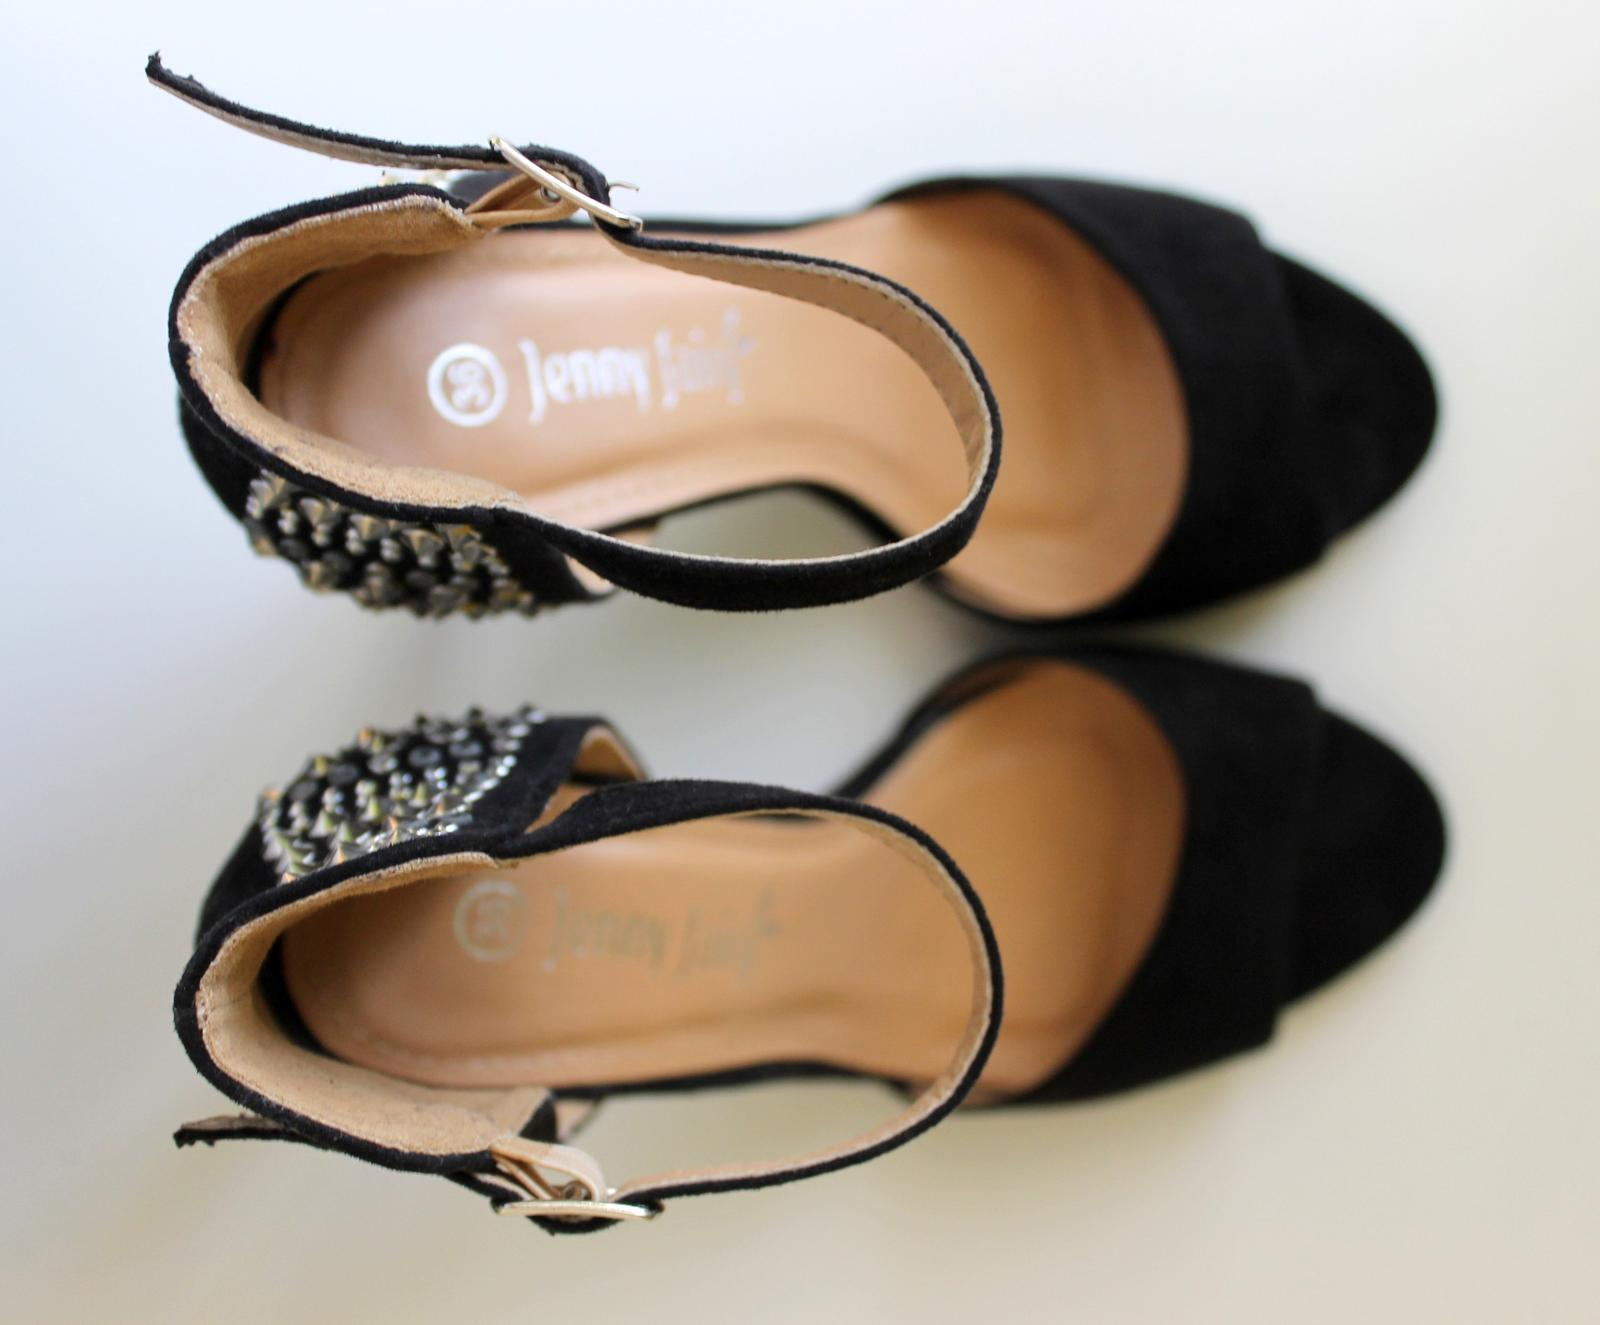 Vysoké čierne vybíjané sandálky - NENOSENÉ - Obrázok č. 3